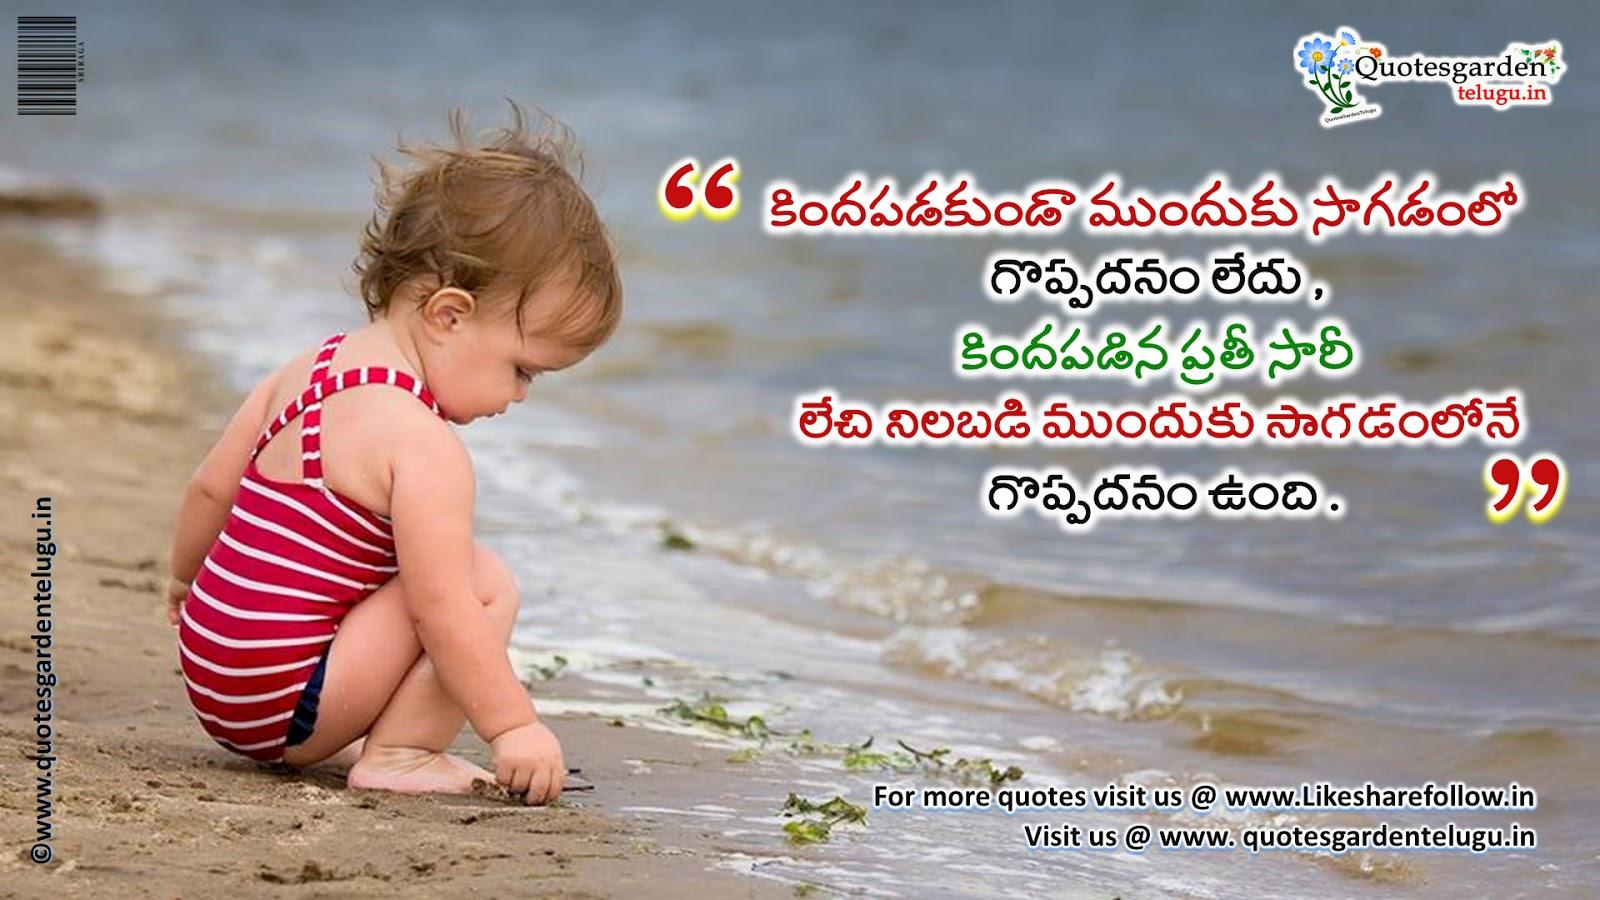 Telugu Inspirational Quotations Quotes Garden Telugu Telugu